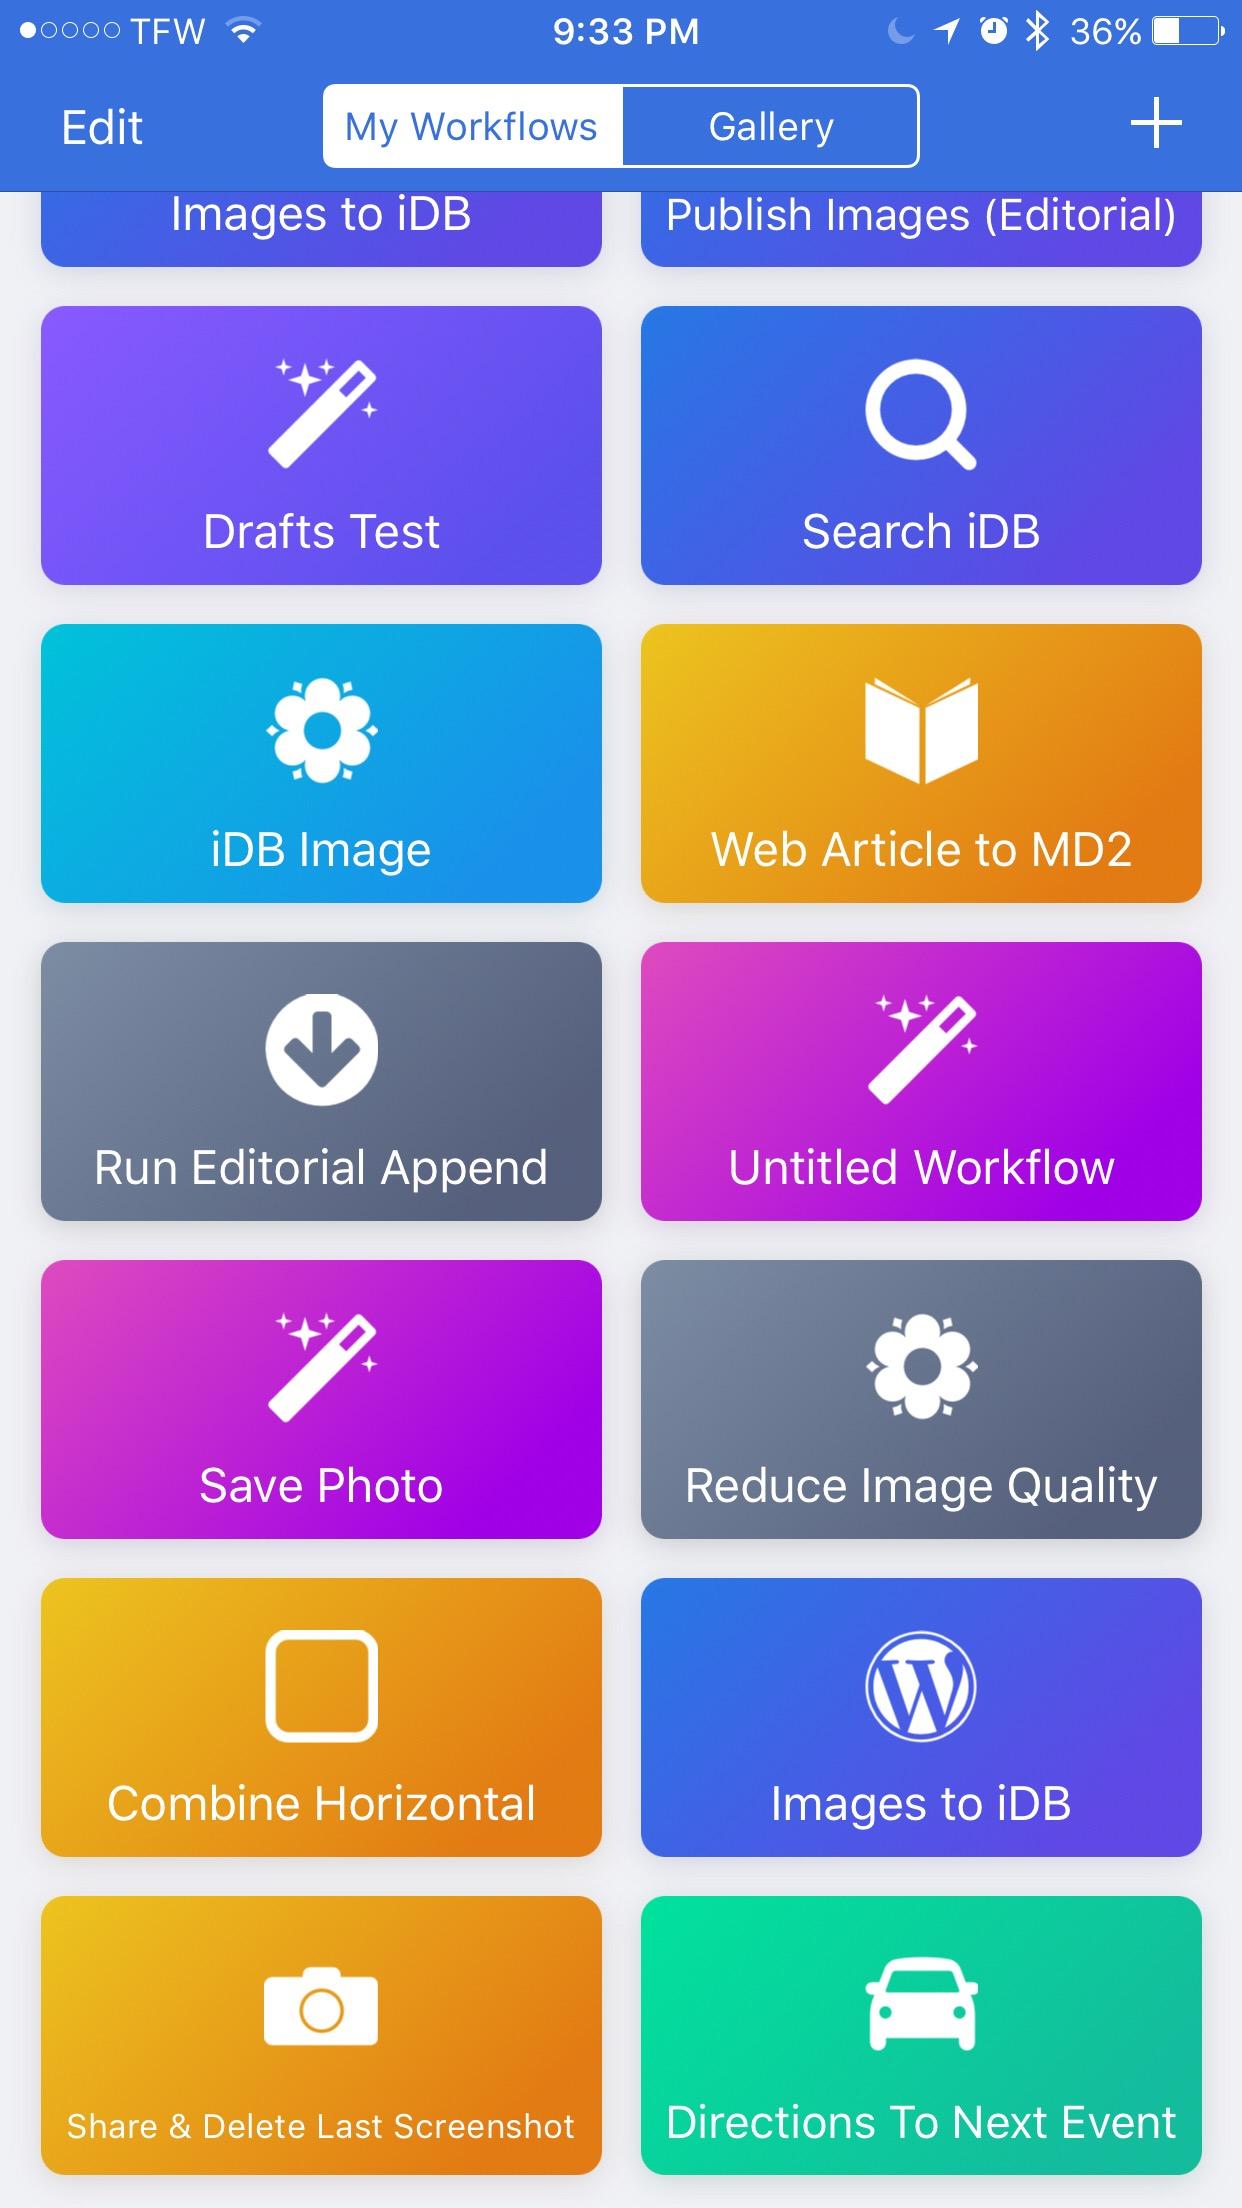 Workflow redesign 2